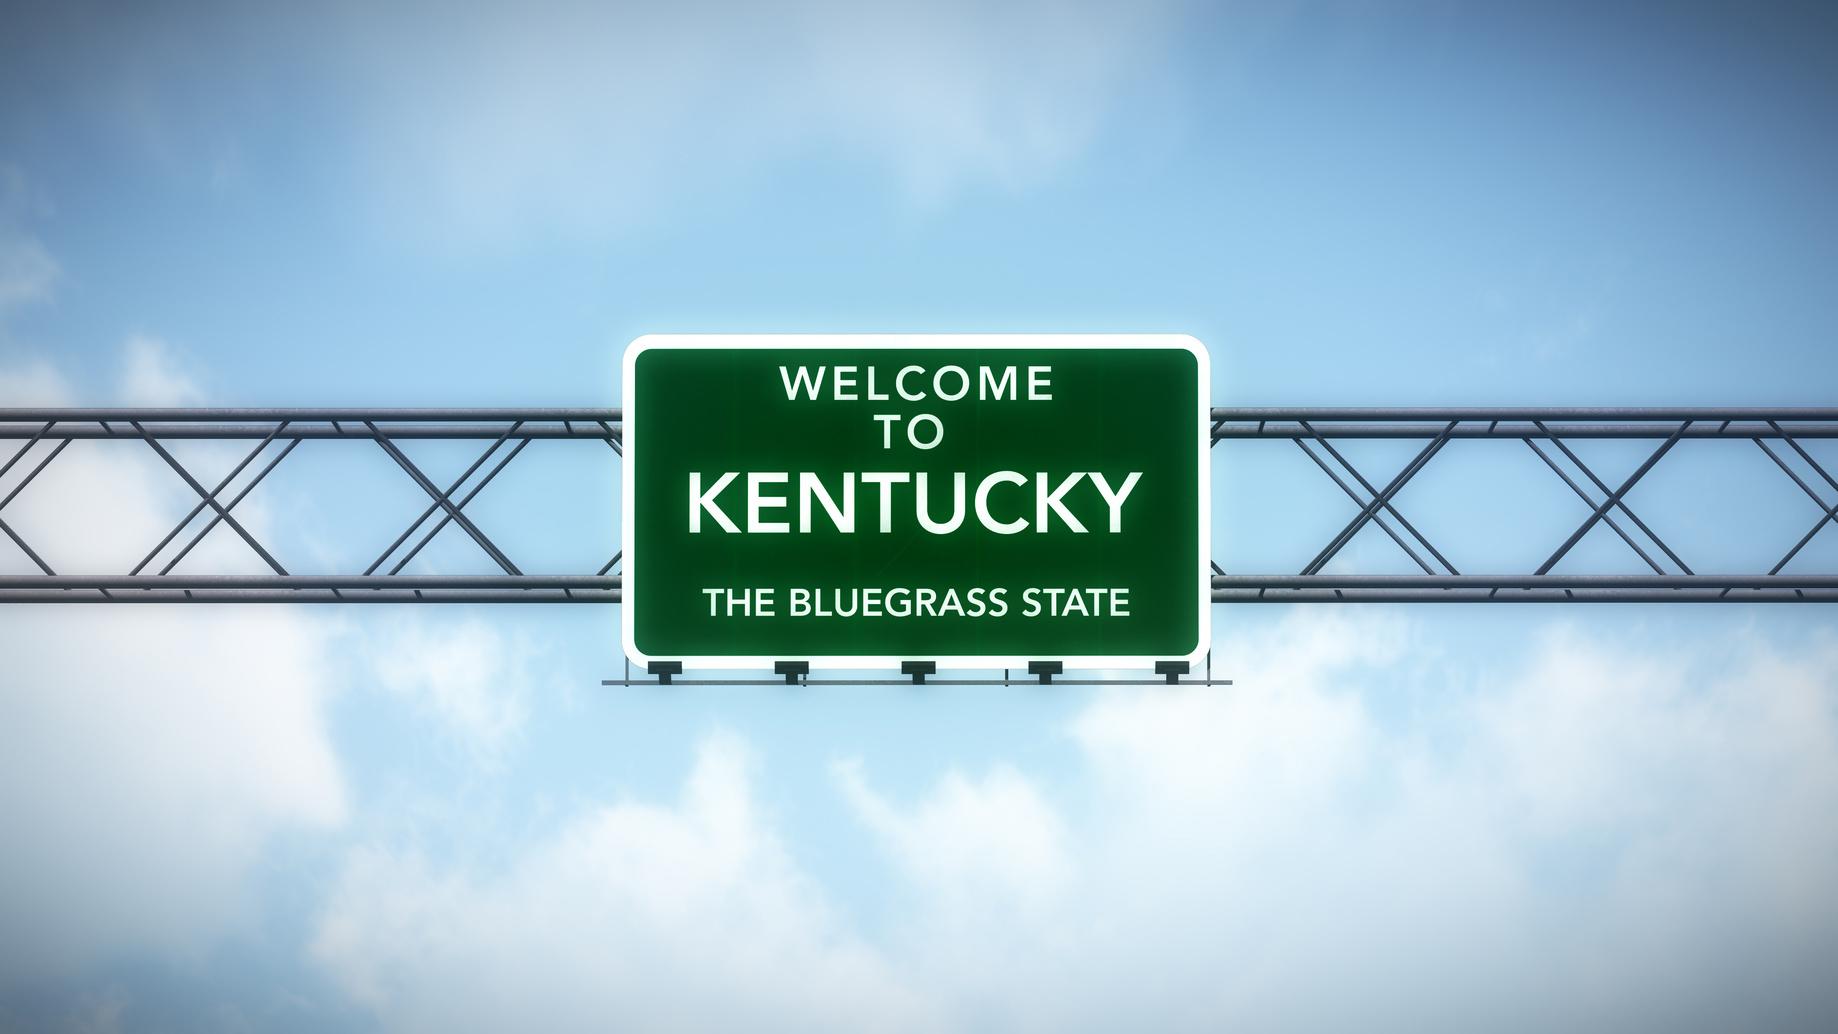 Ky_BluegrassSign.jpg